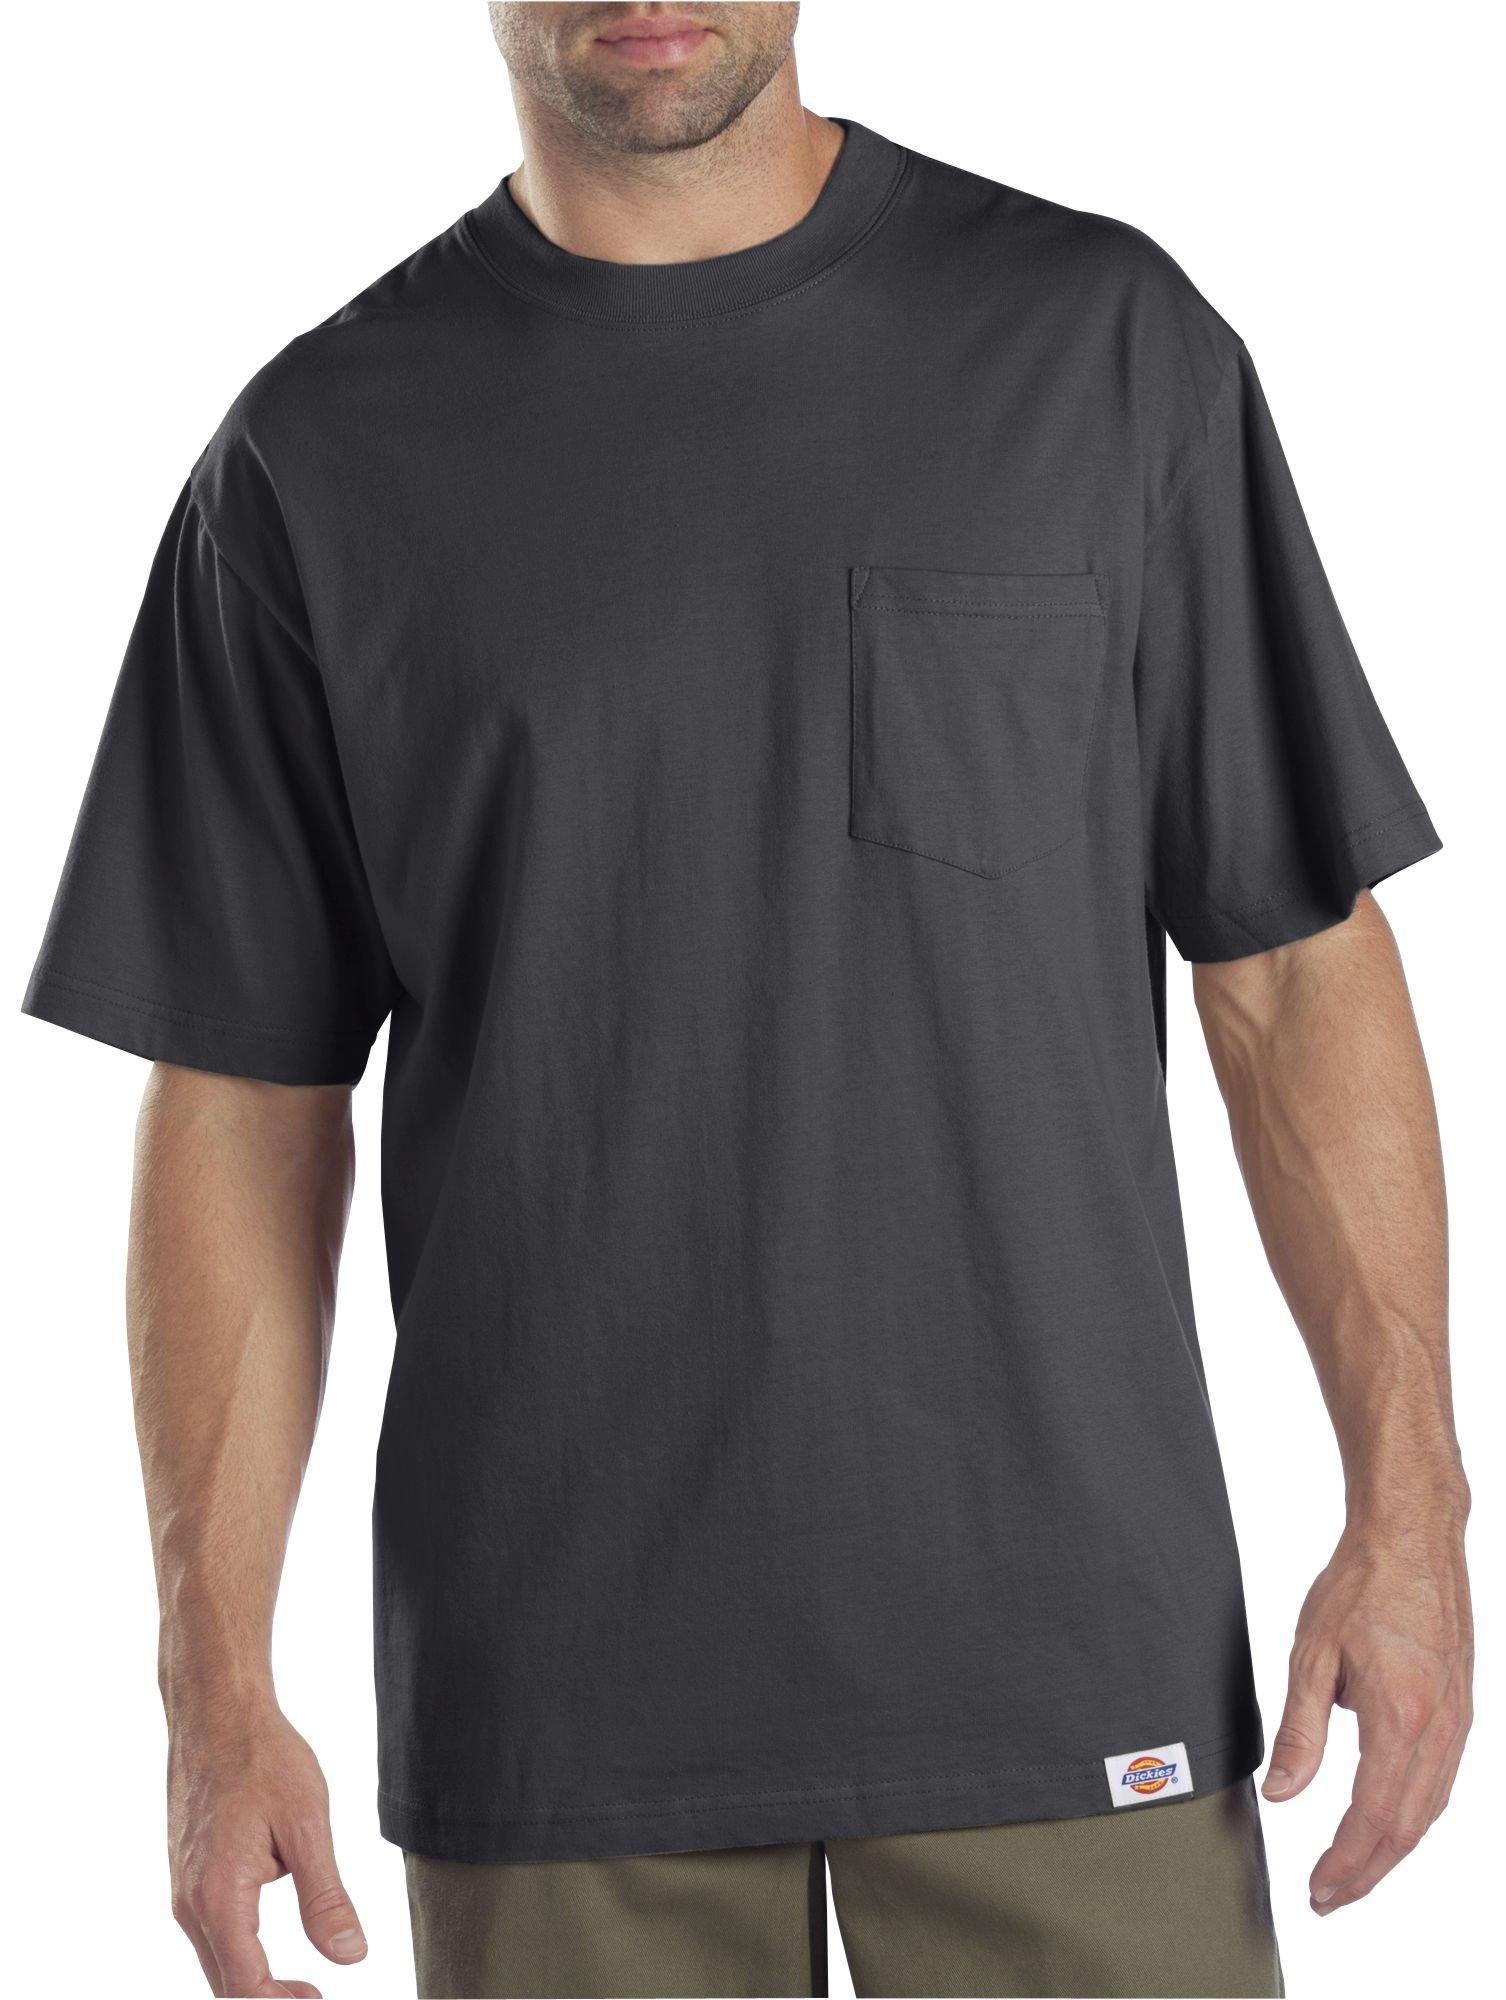 Dickies Men's Short Sleeve Pocket T-Shirt 2-Pack, Charcoal, X-Large